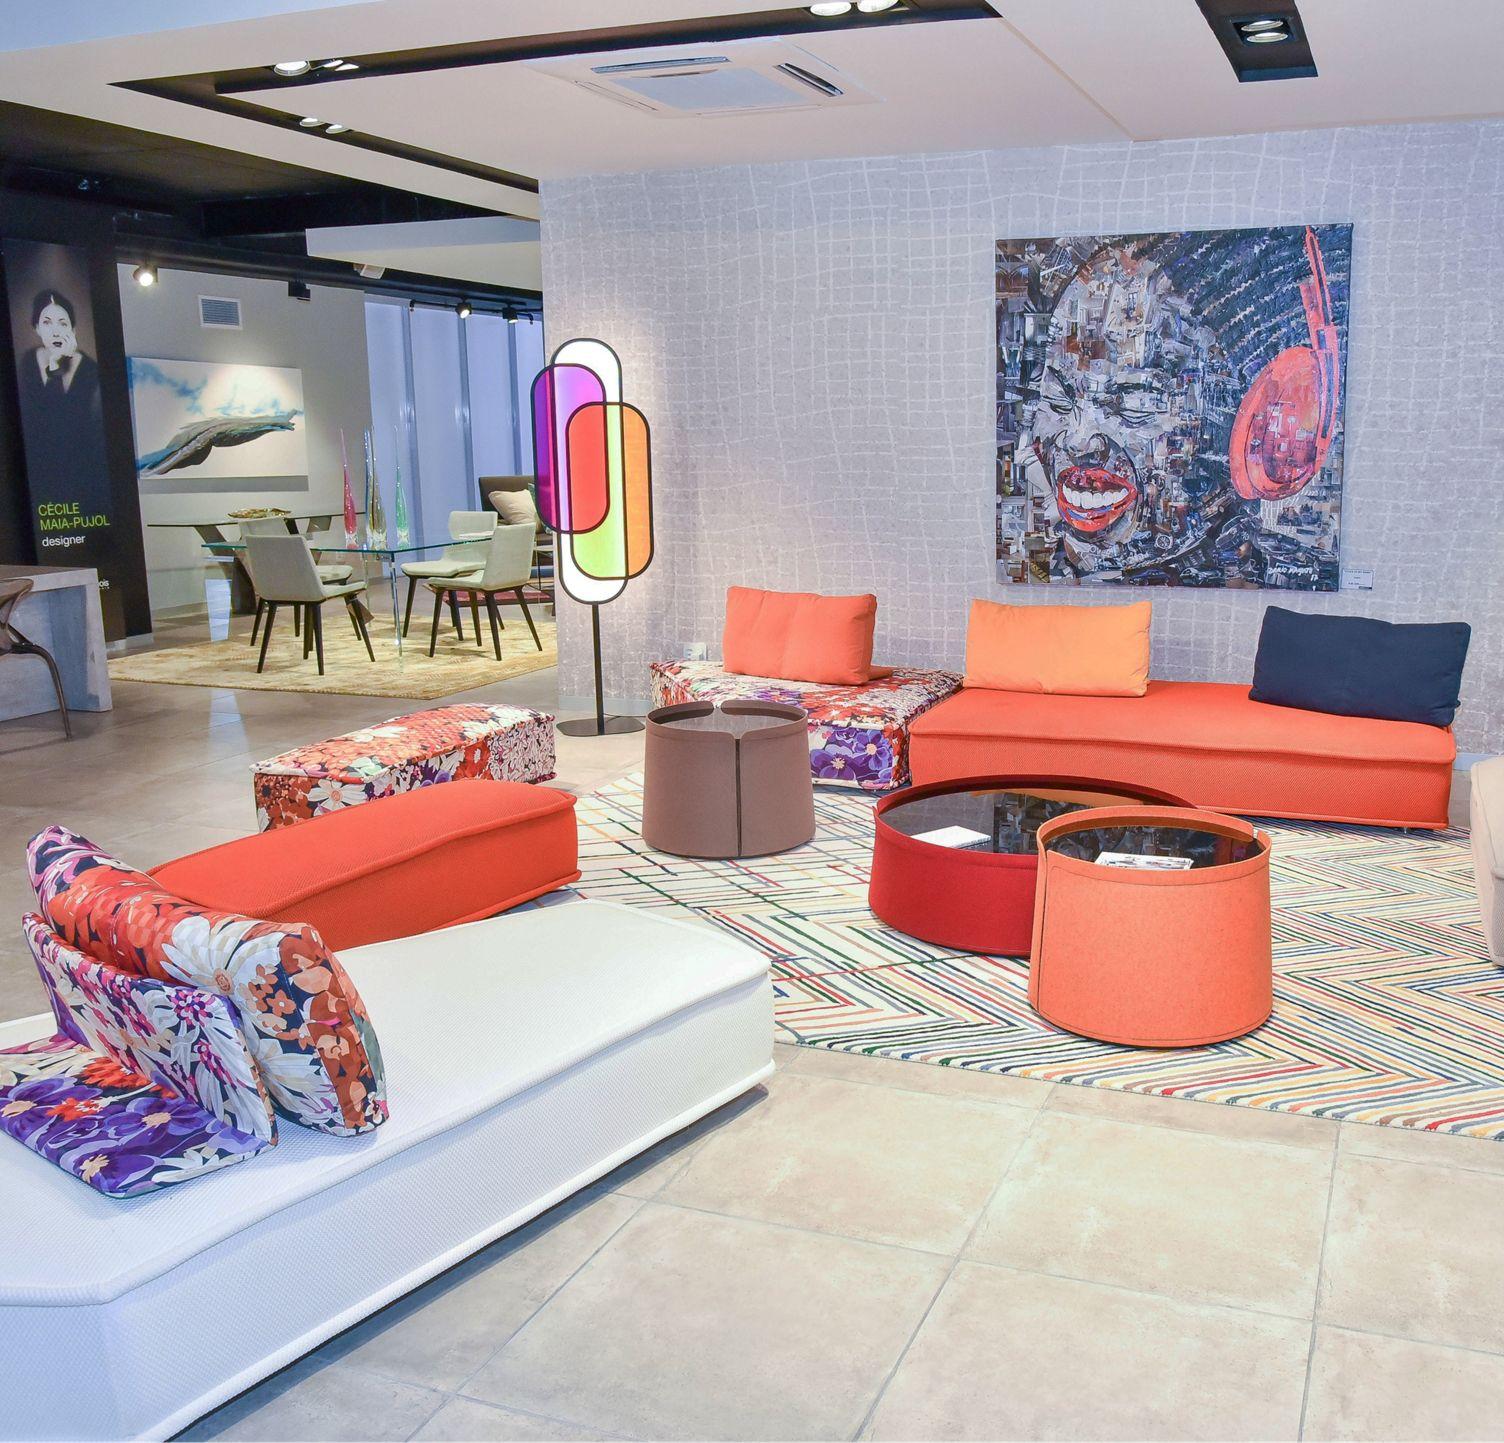 roche bobois showroom johannesburg 2031. Black Bedroom Furniture Sets. Home Design Ideas